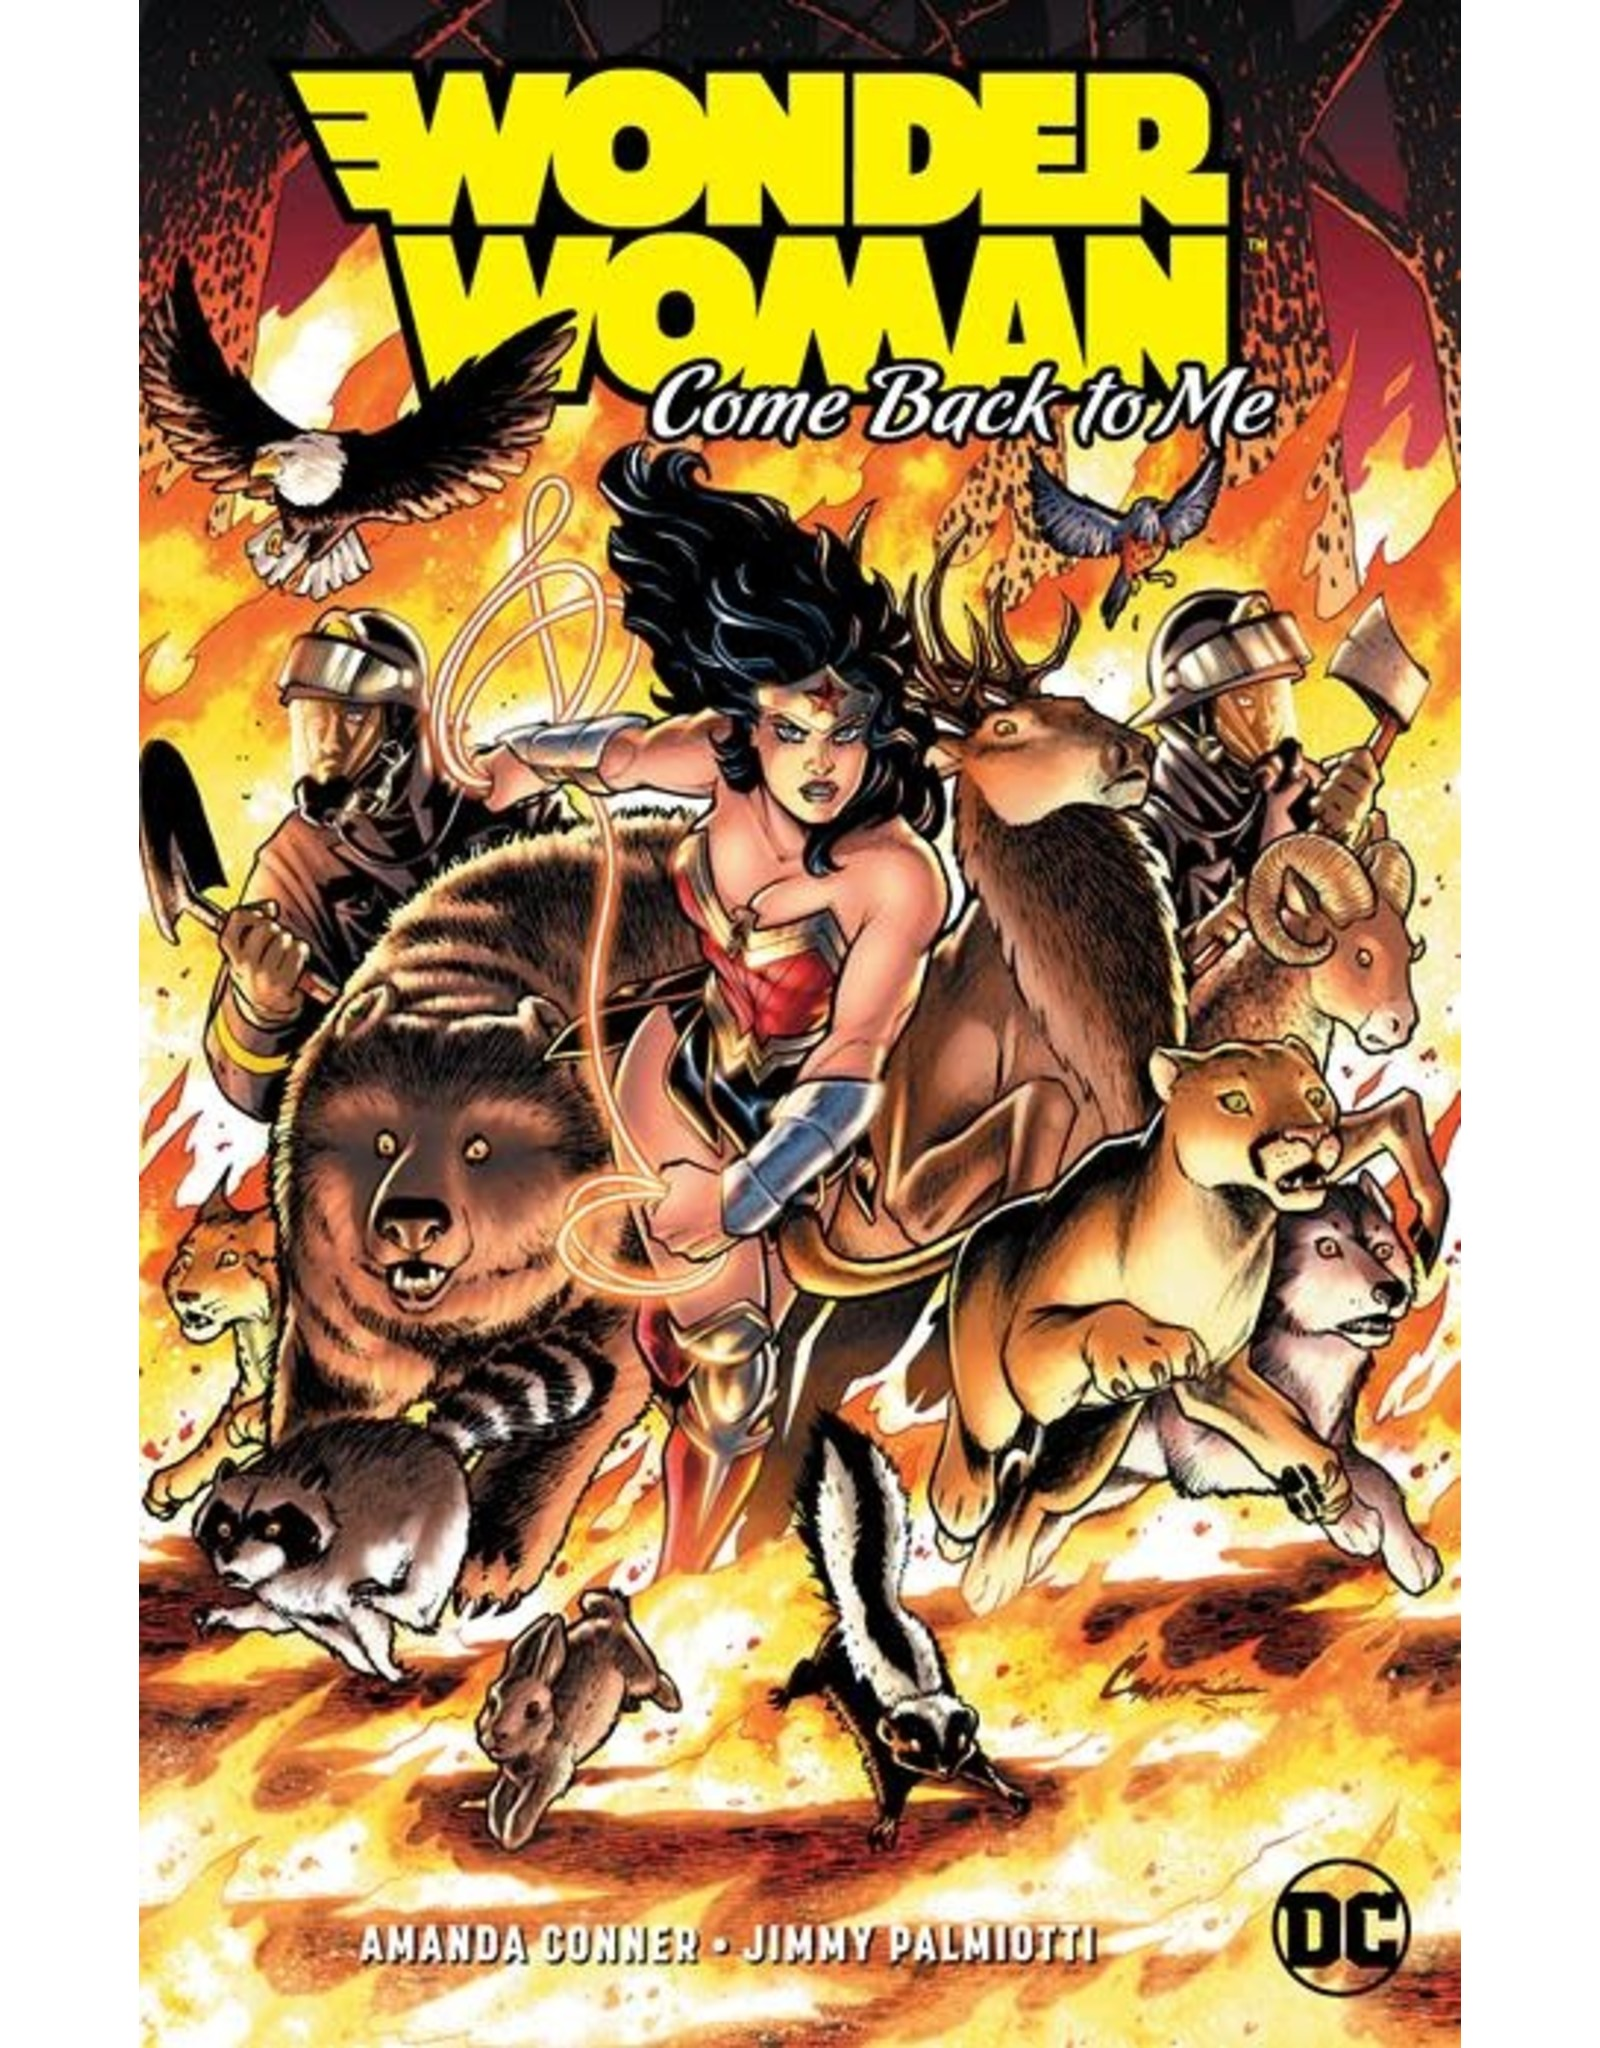 DC COMICS WONDER WOMAN COME BACK TO ME TP